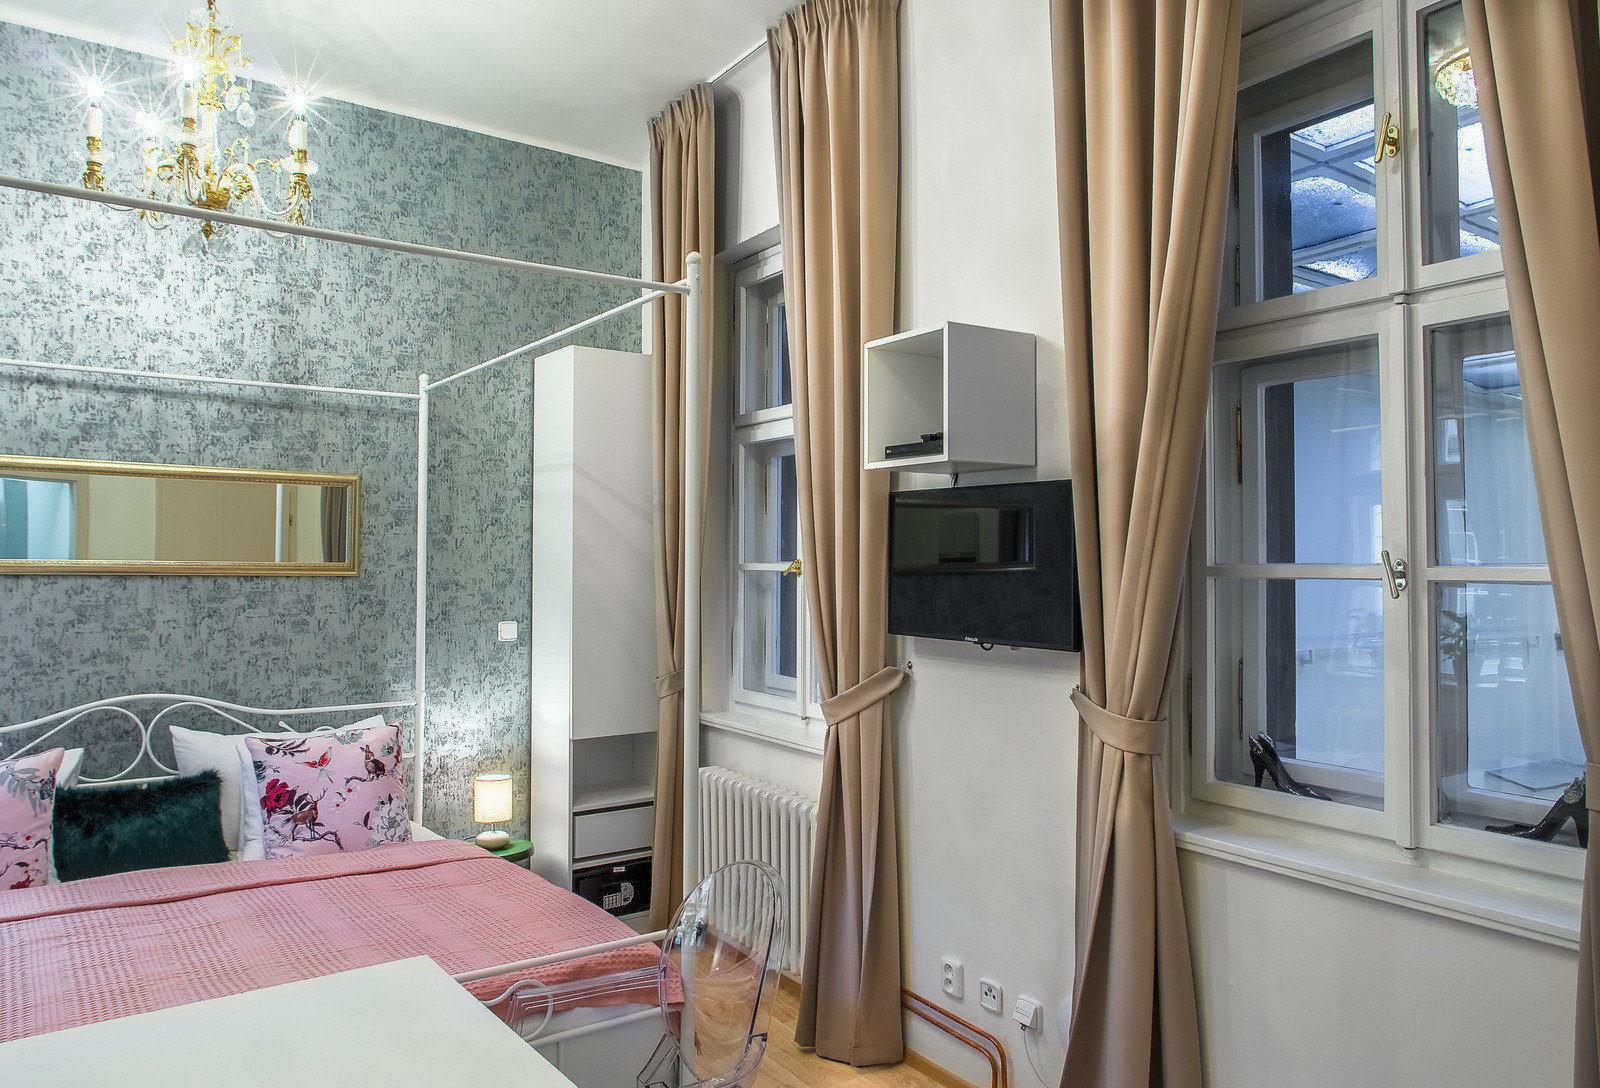 7 tales suites studio cinderella prague residence for Royal boutique residence prague